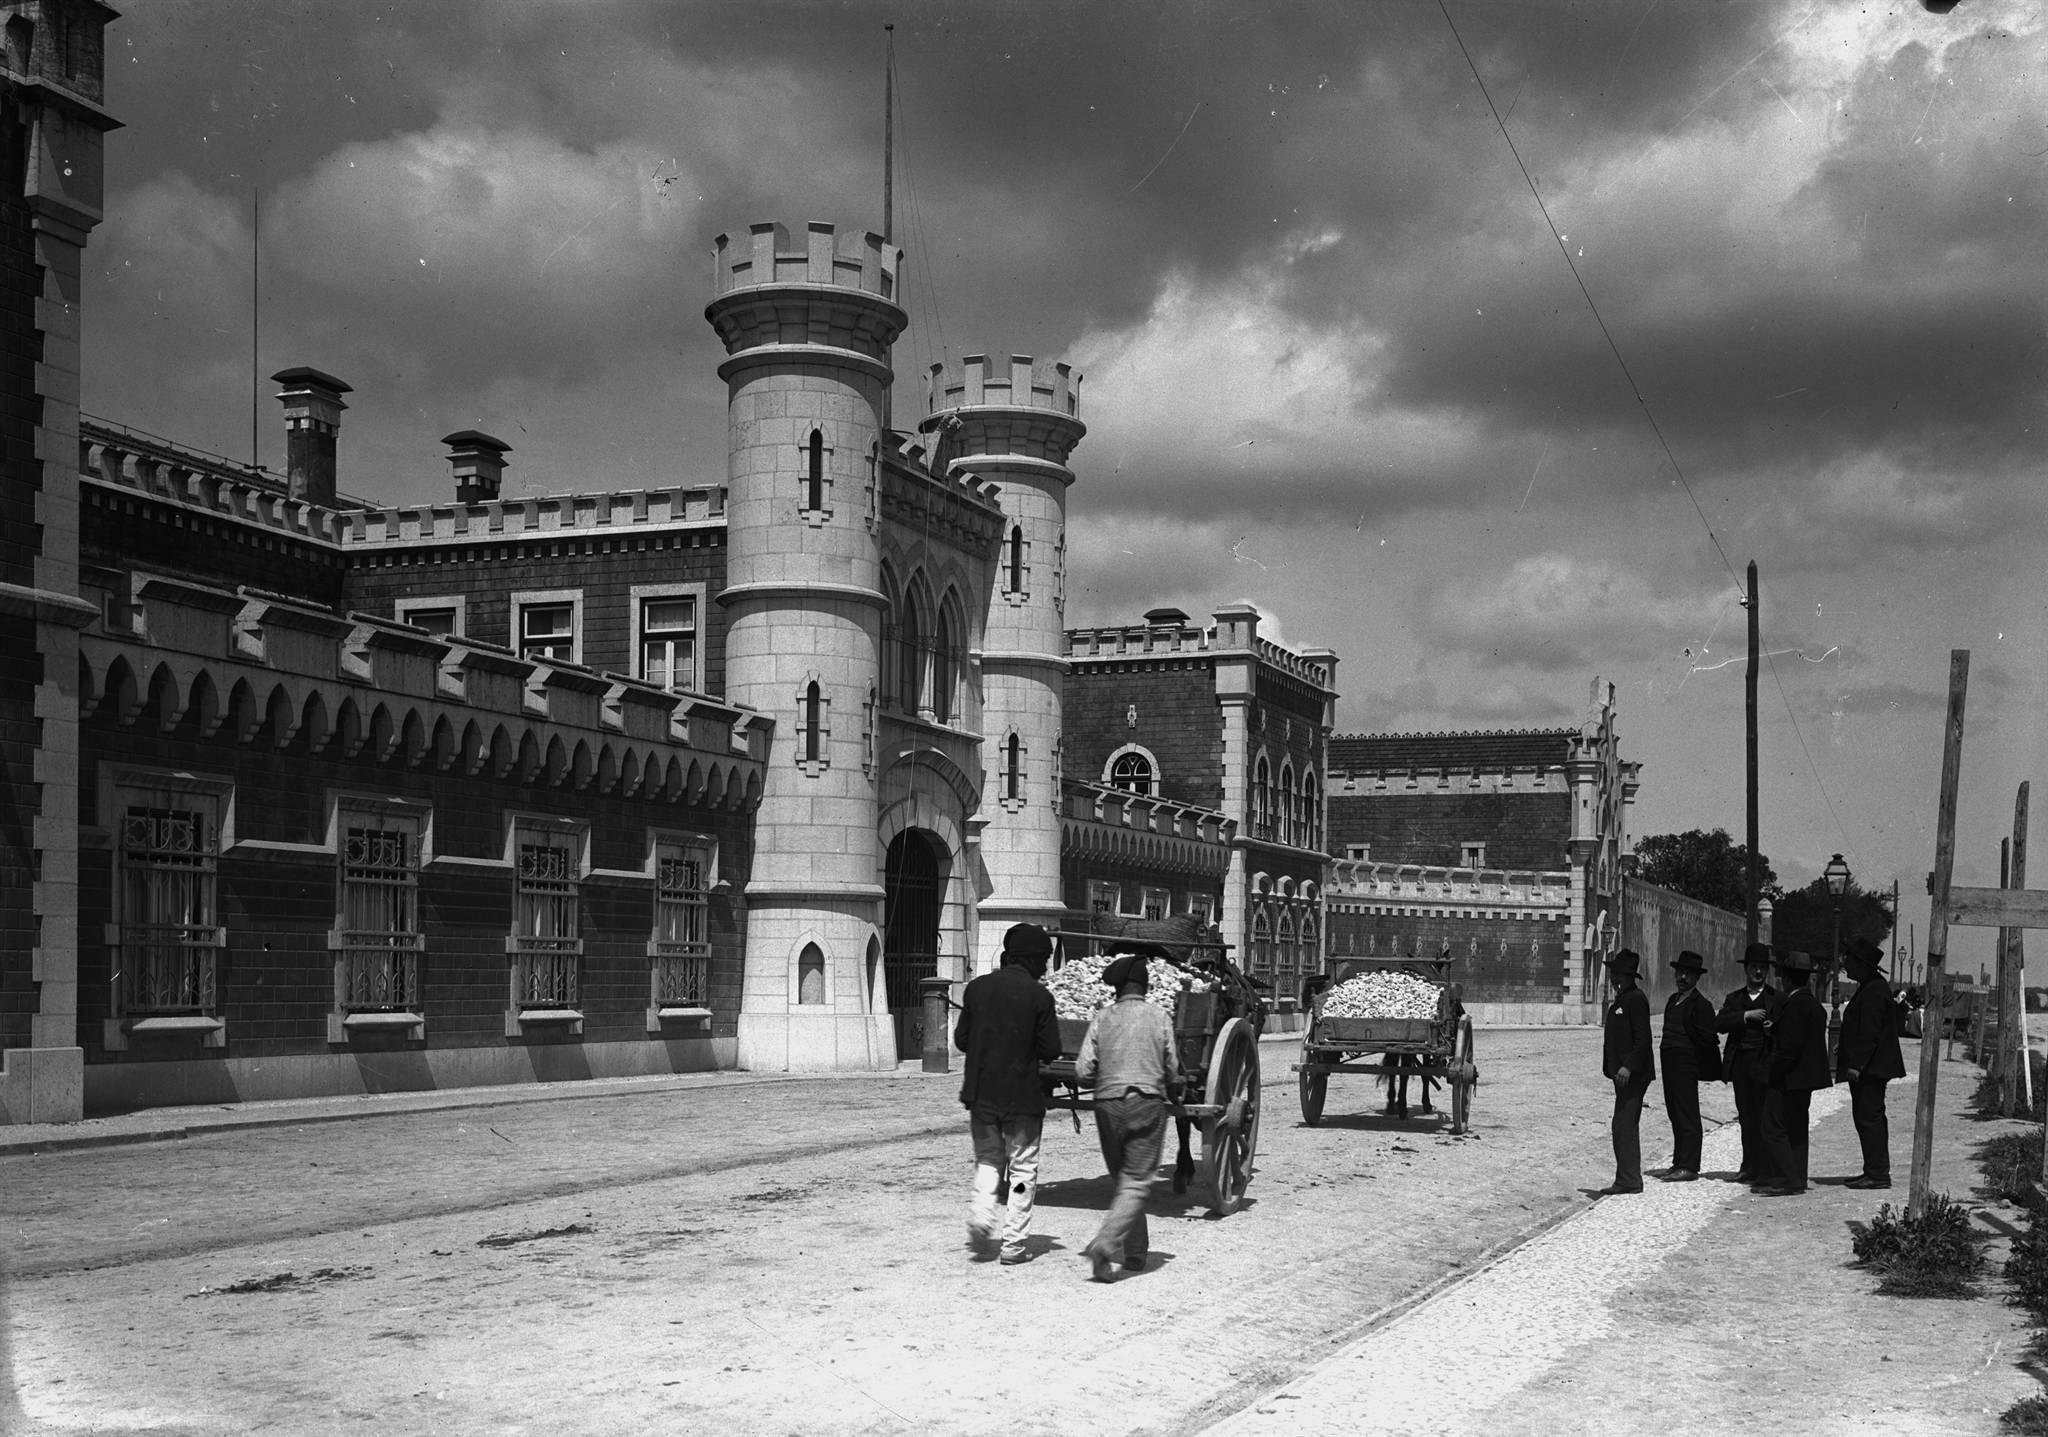 Transporte de pedra junto à Penitenciária, Lisboa (P.Guedes, c. 1910)